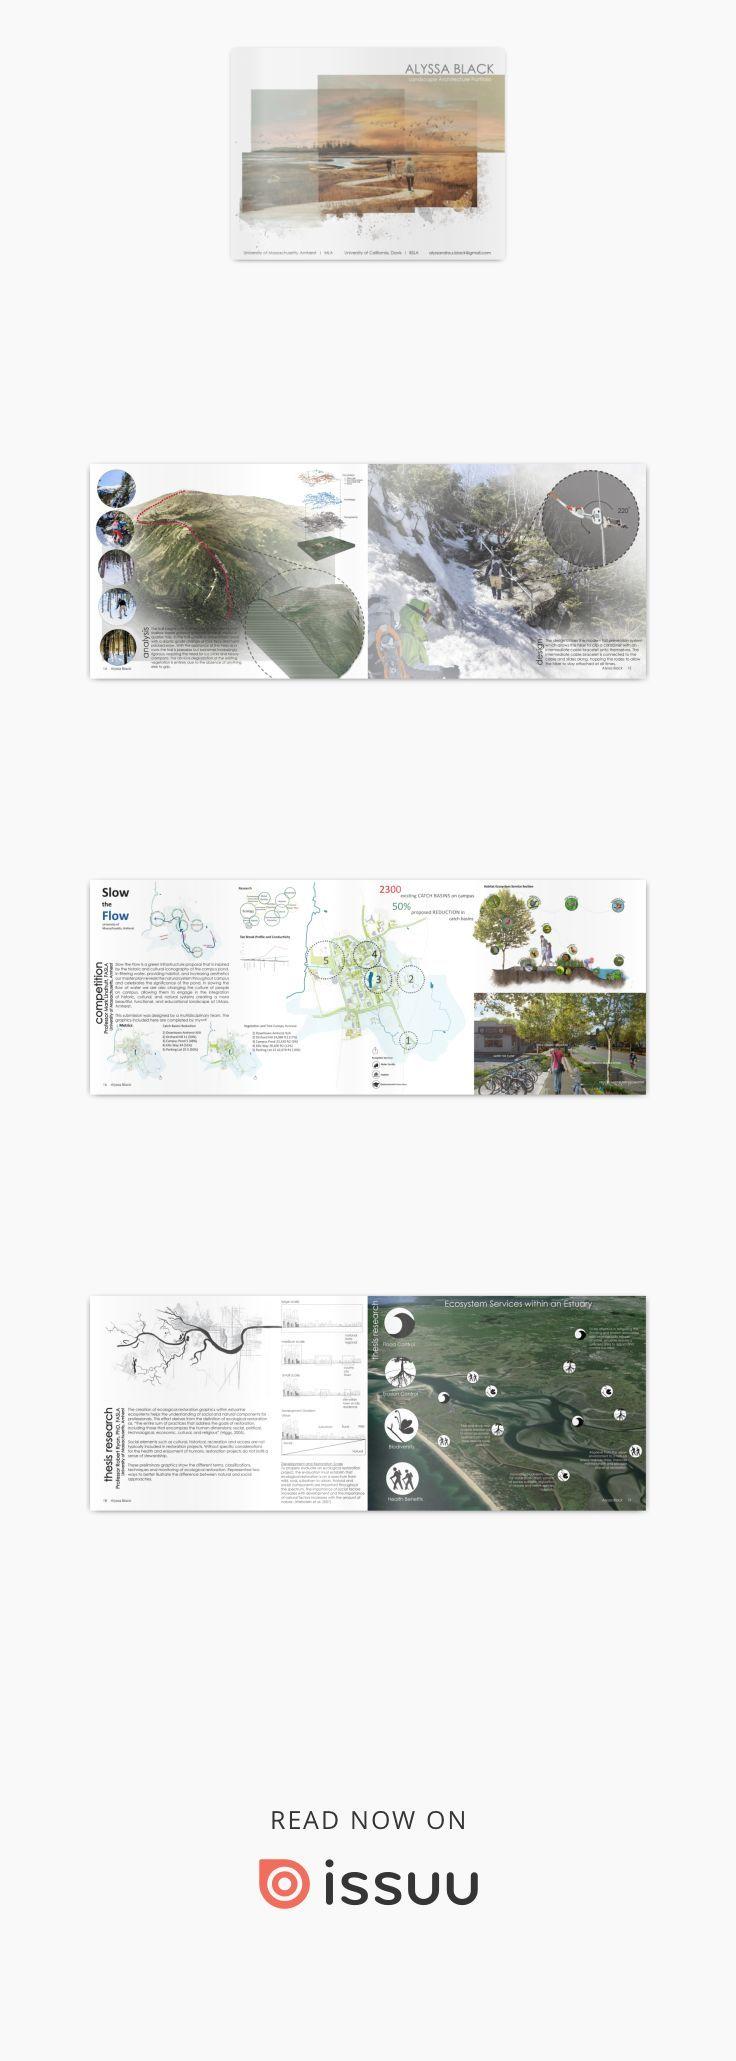 Alyssa Black Landscape Architecture Portfolio